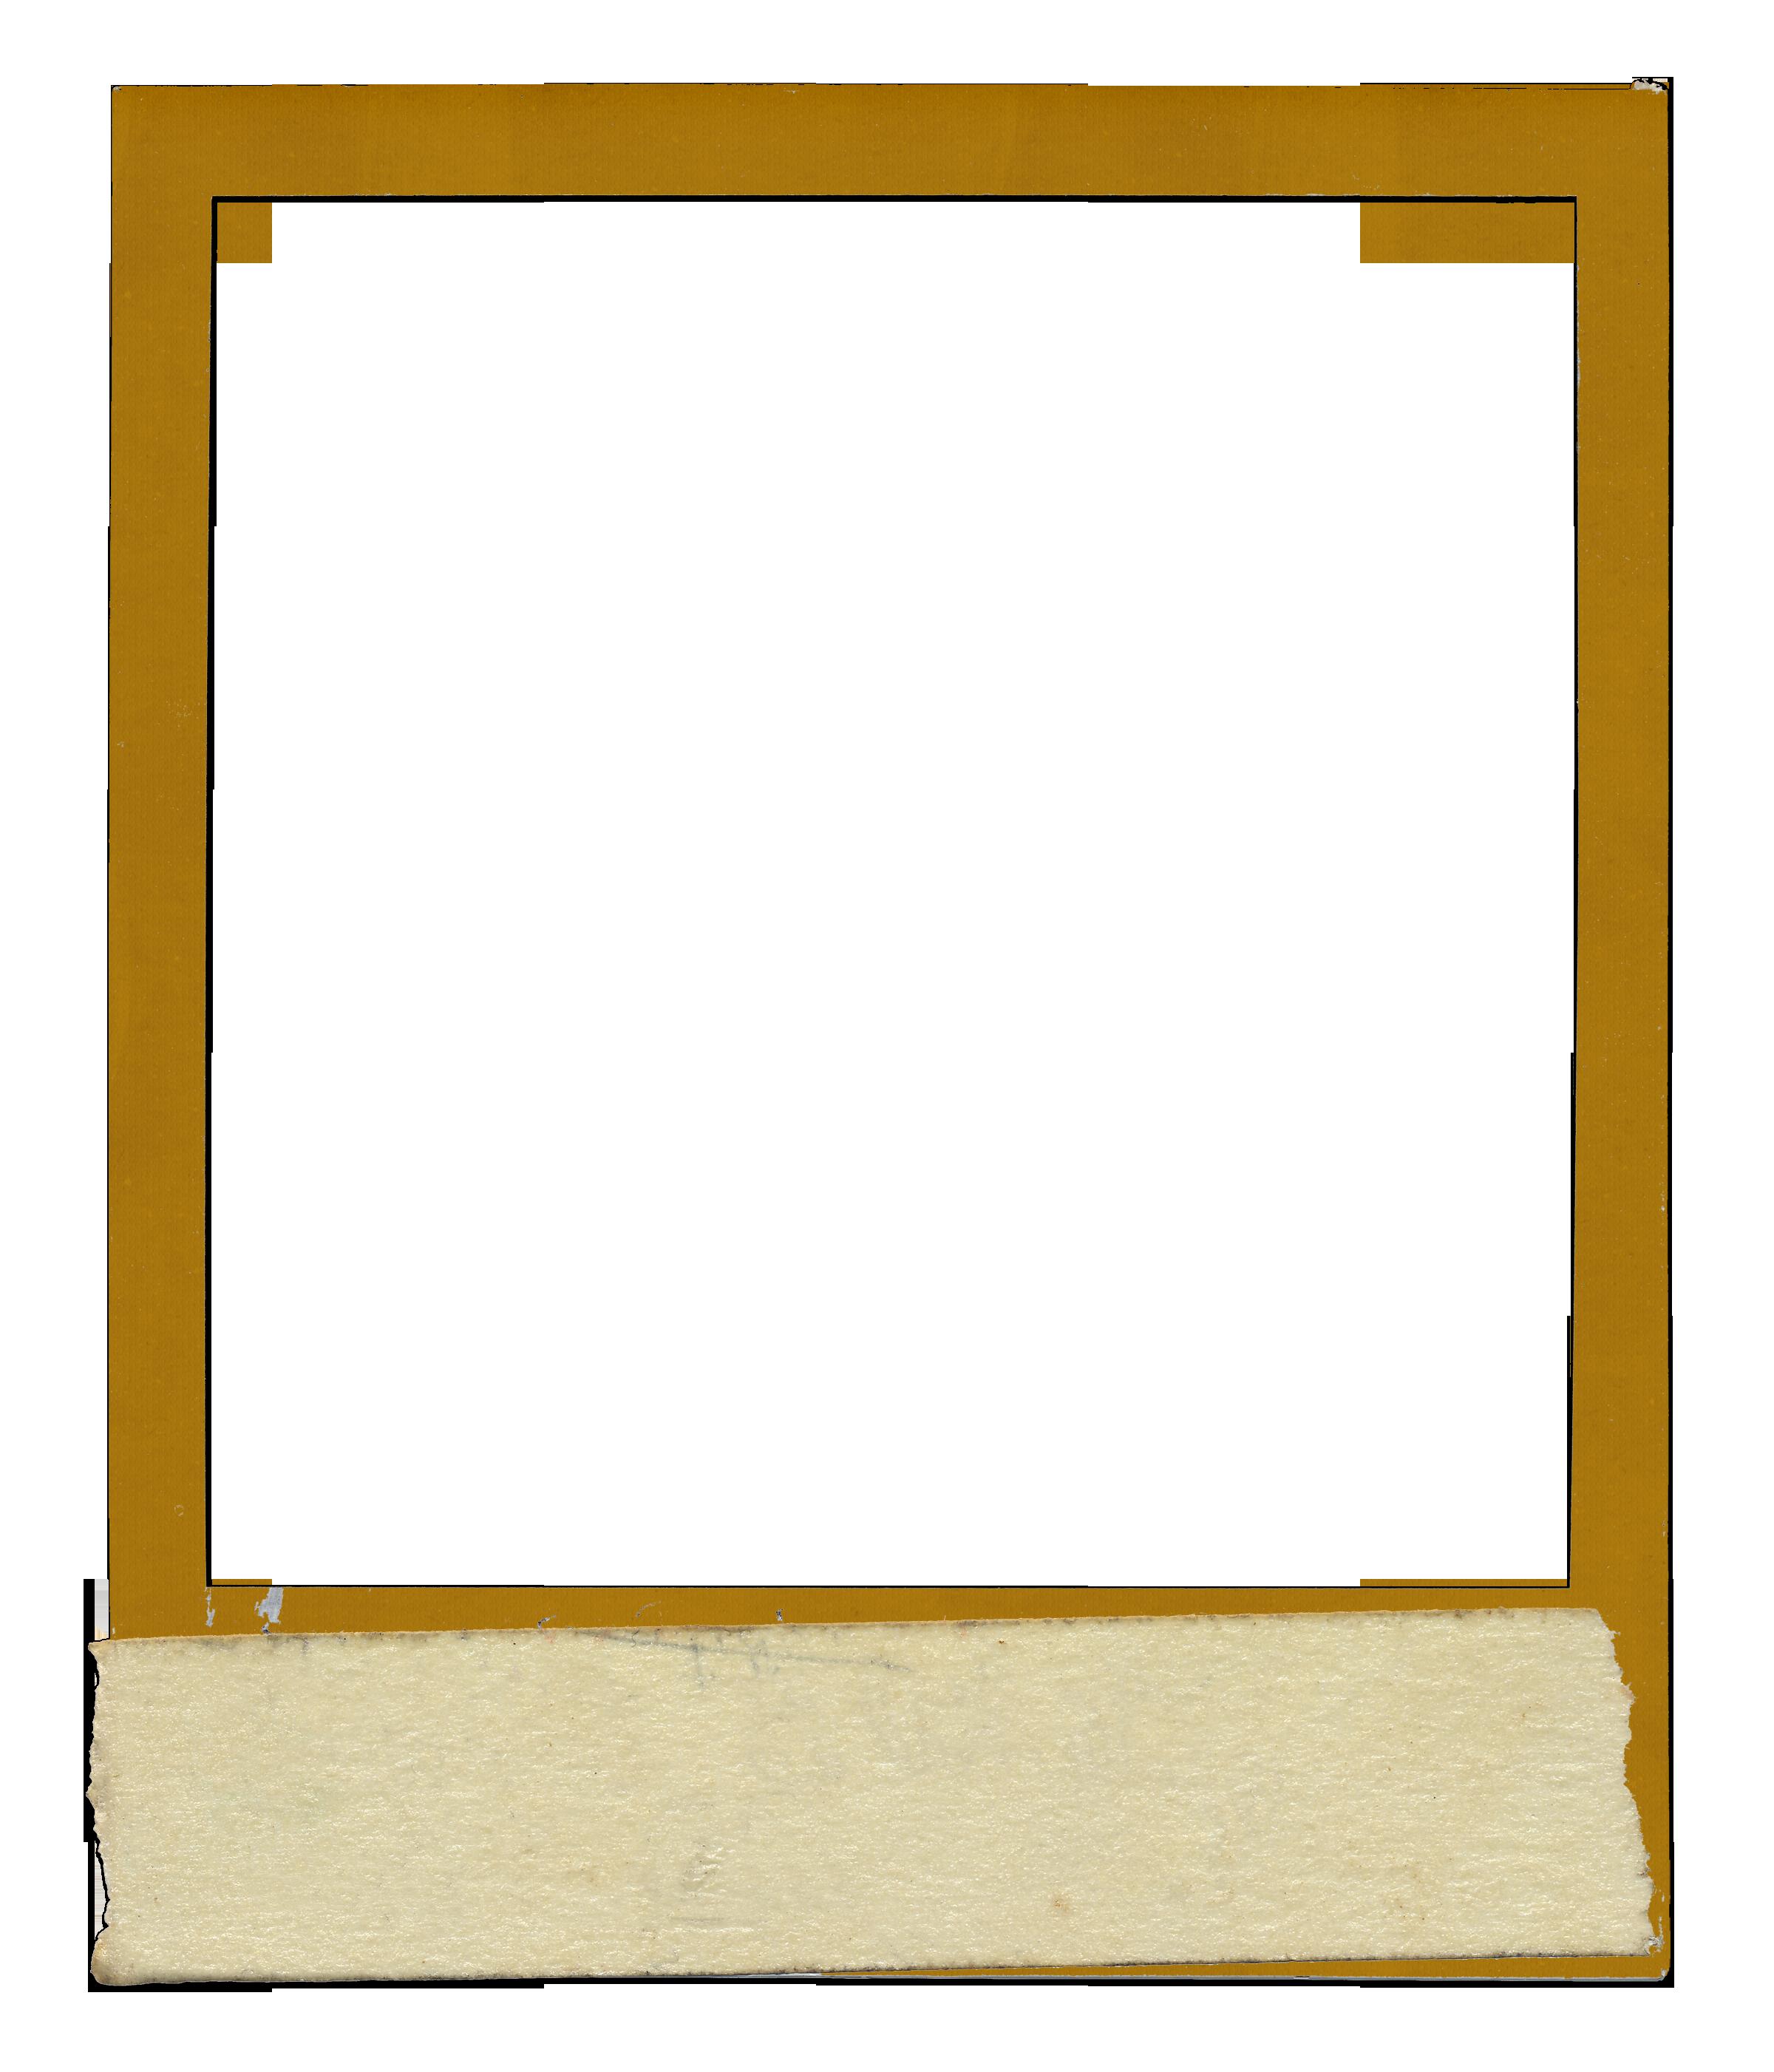 Vintage polaroid frame png. Template psd goal goodwinmetals